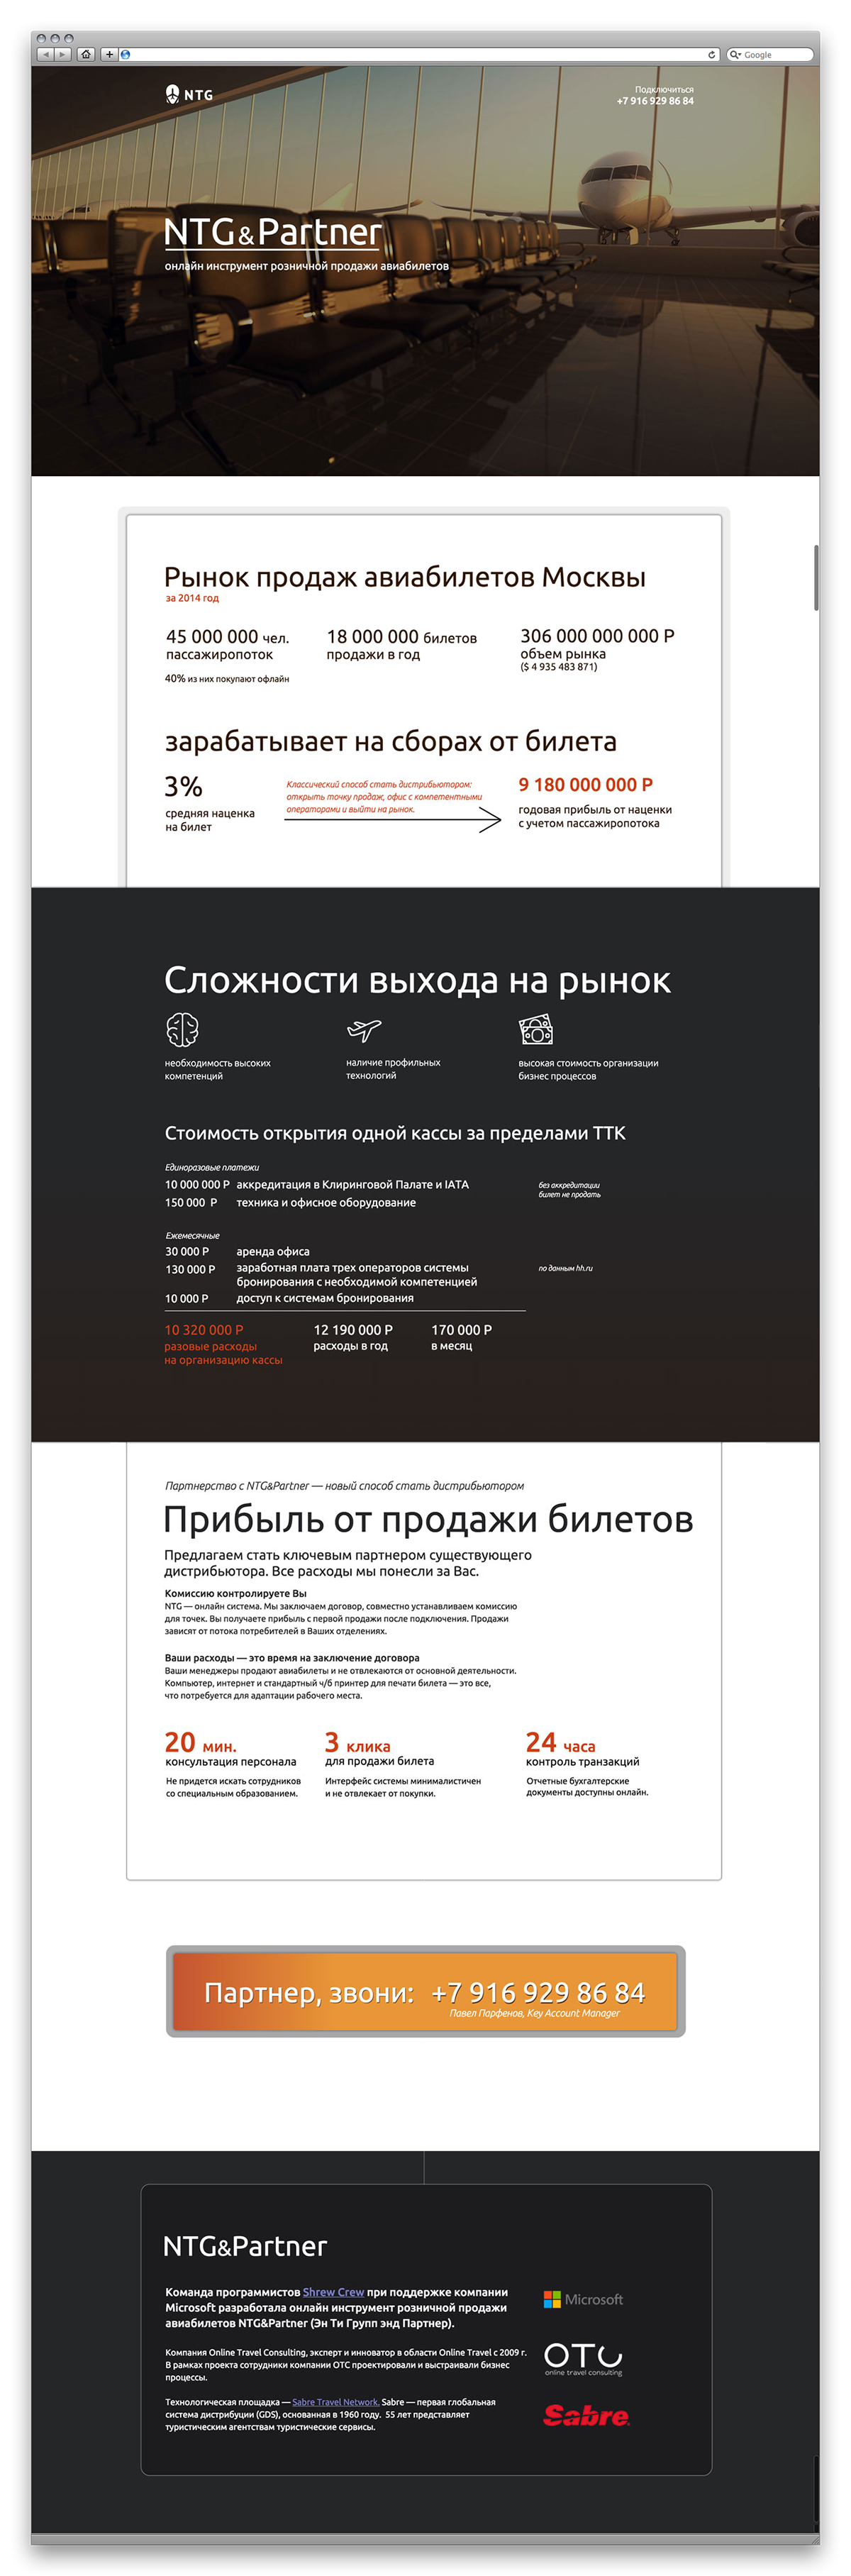 Travel tickets b2b business partners presentation